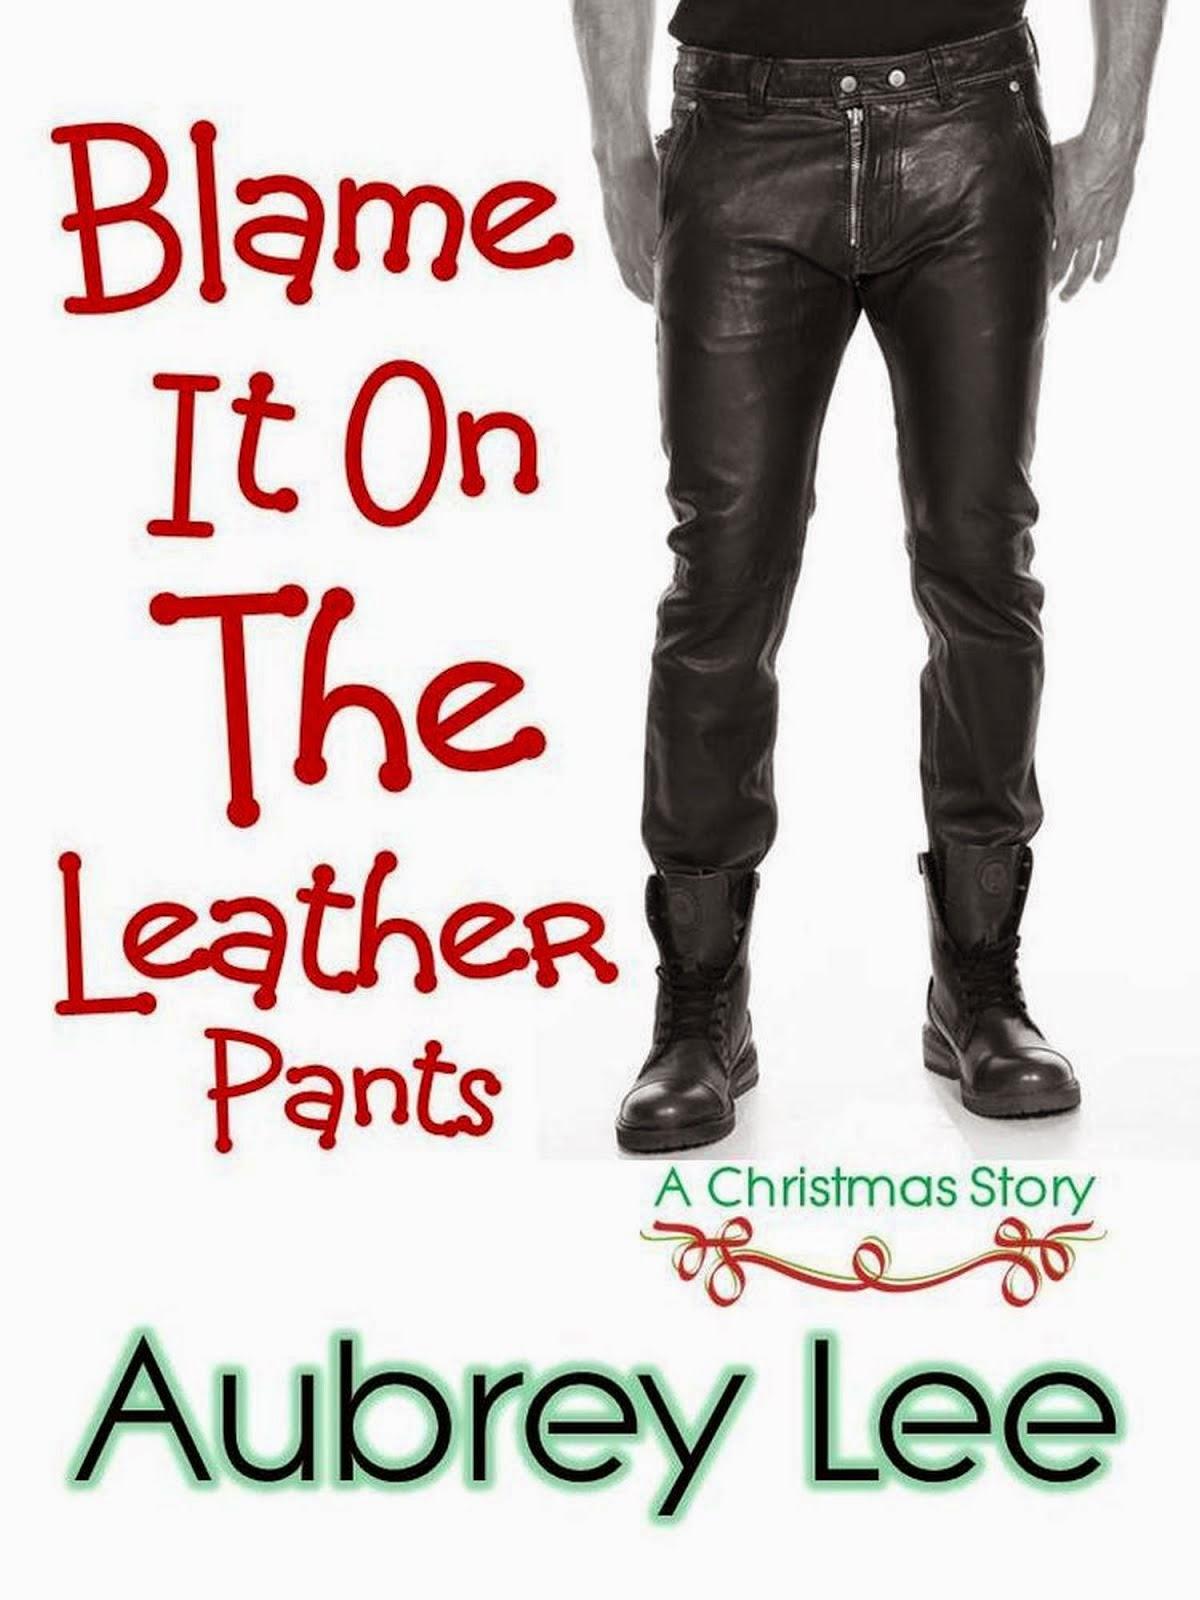 A 5-star Christmas novella!